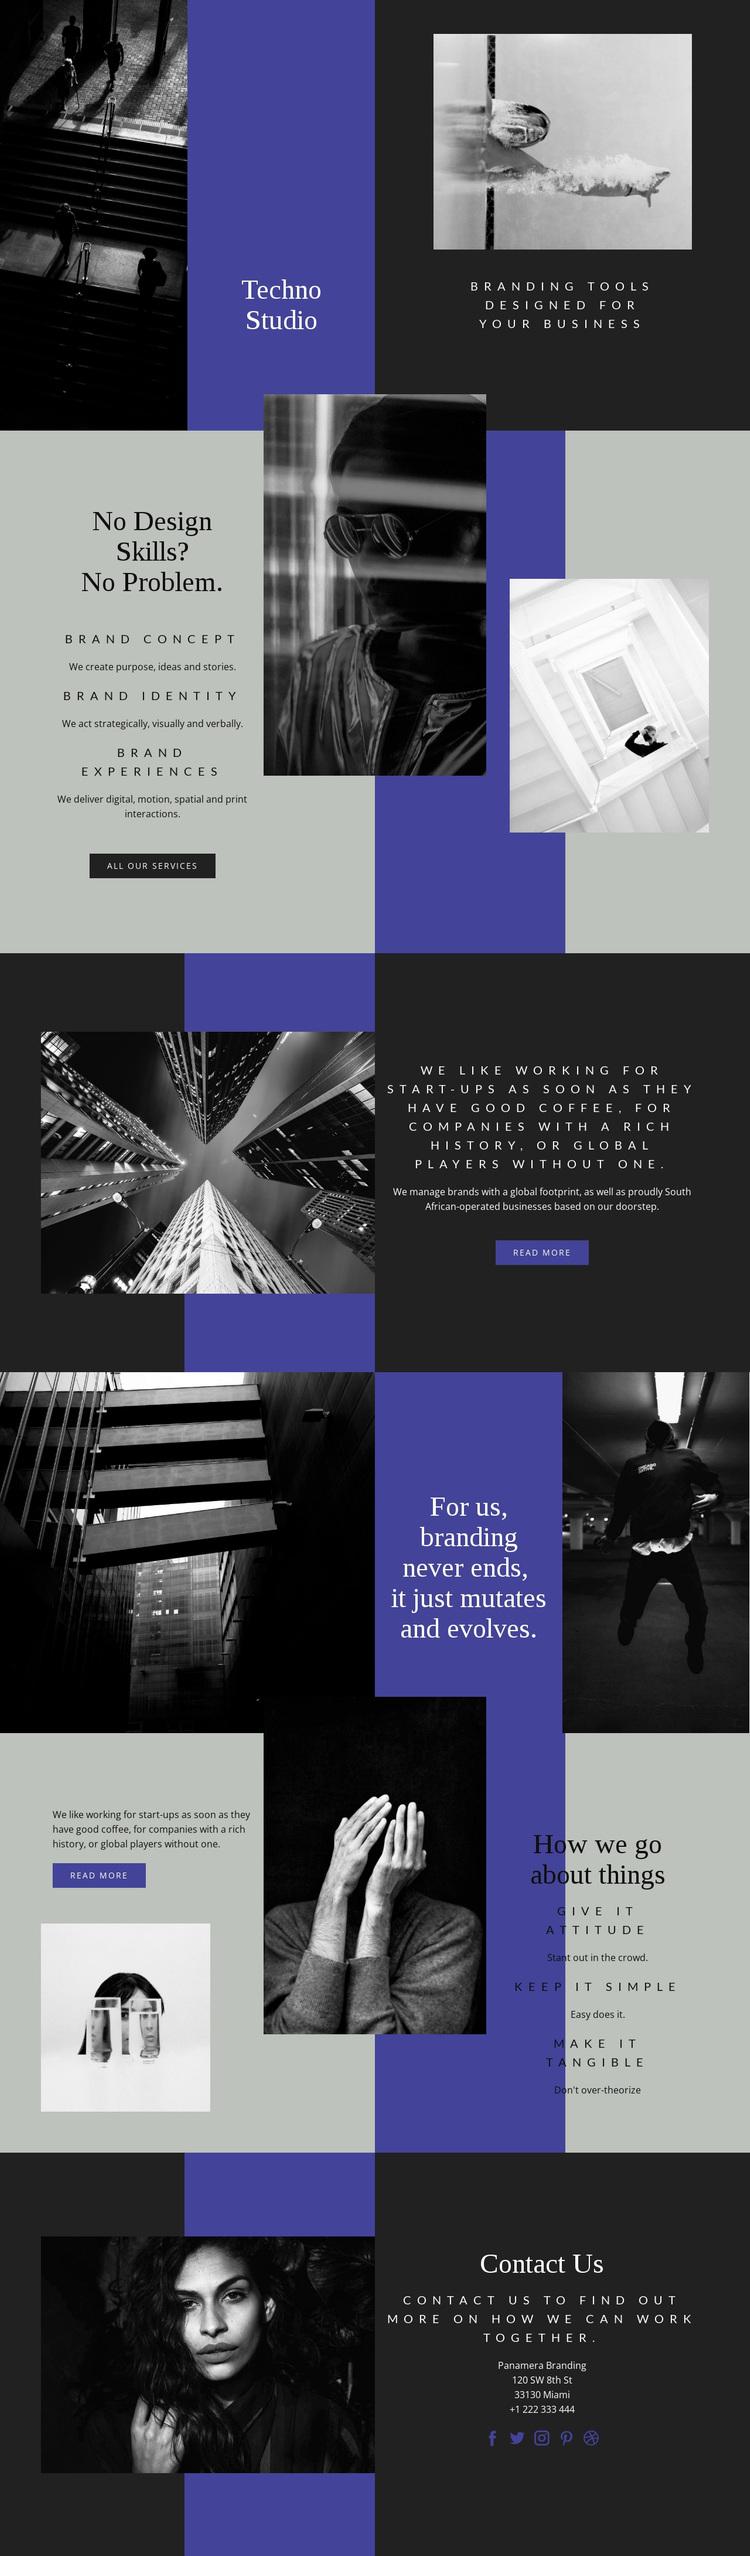 Techno skills in business Joomla Page Builder